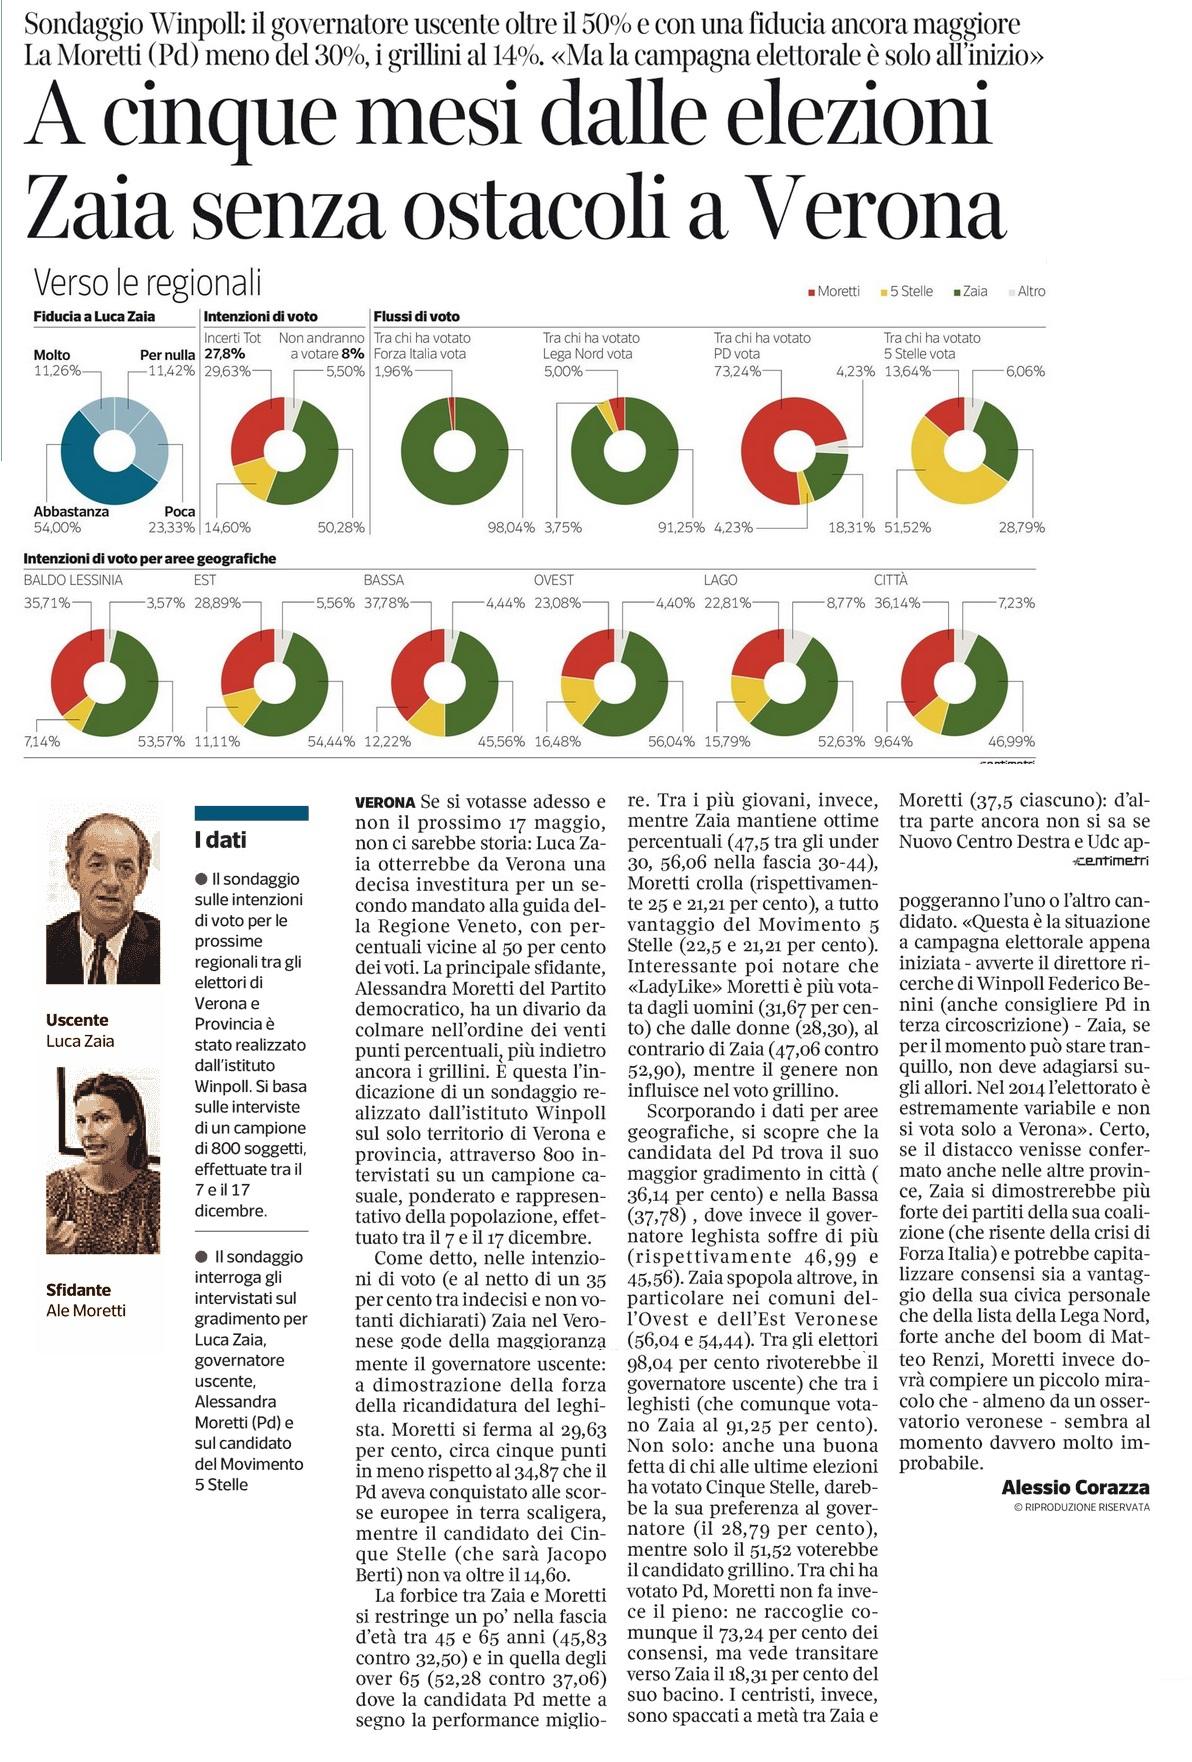 sondaggio-corriere